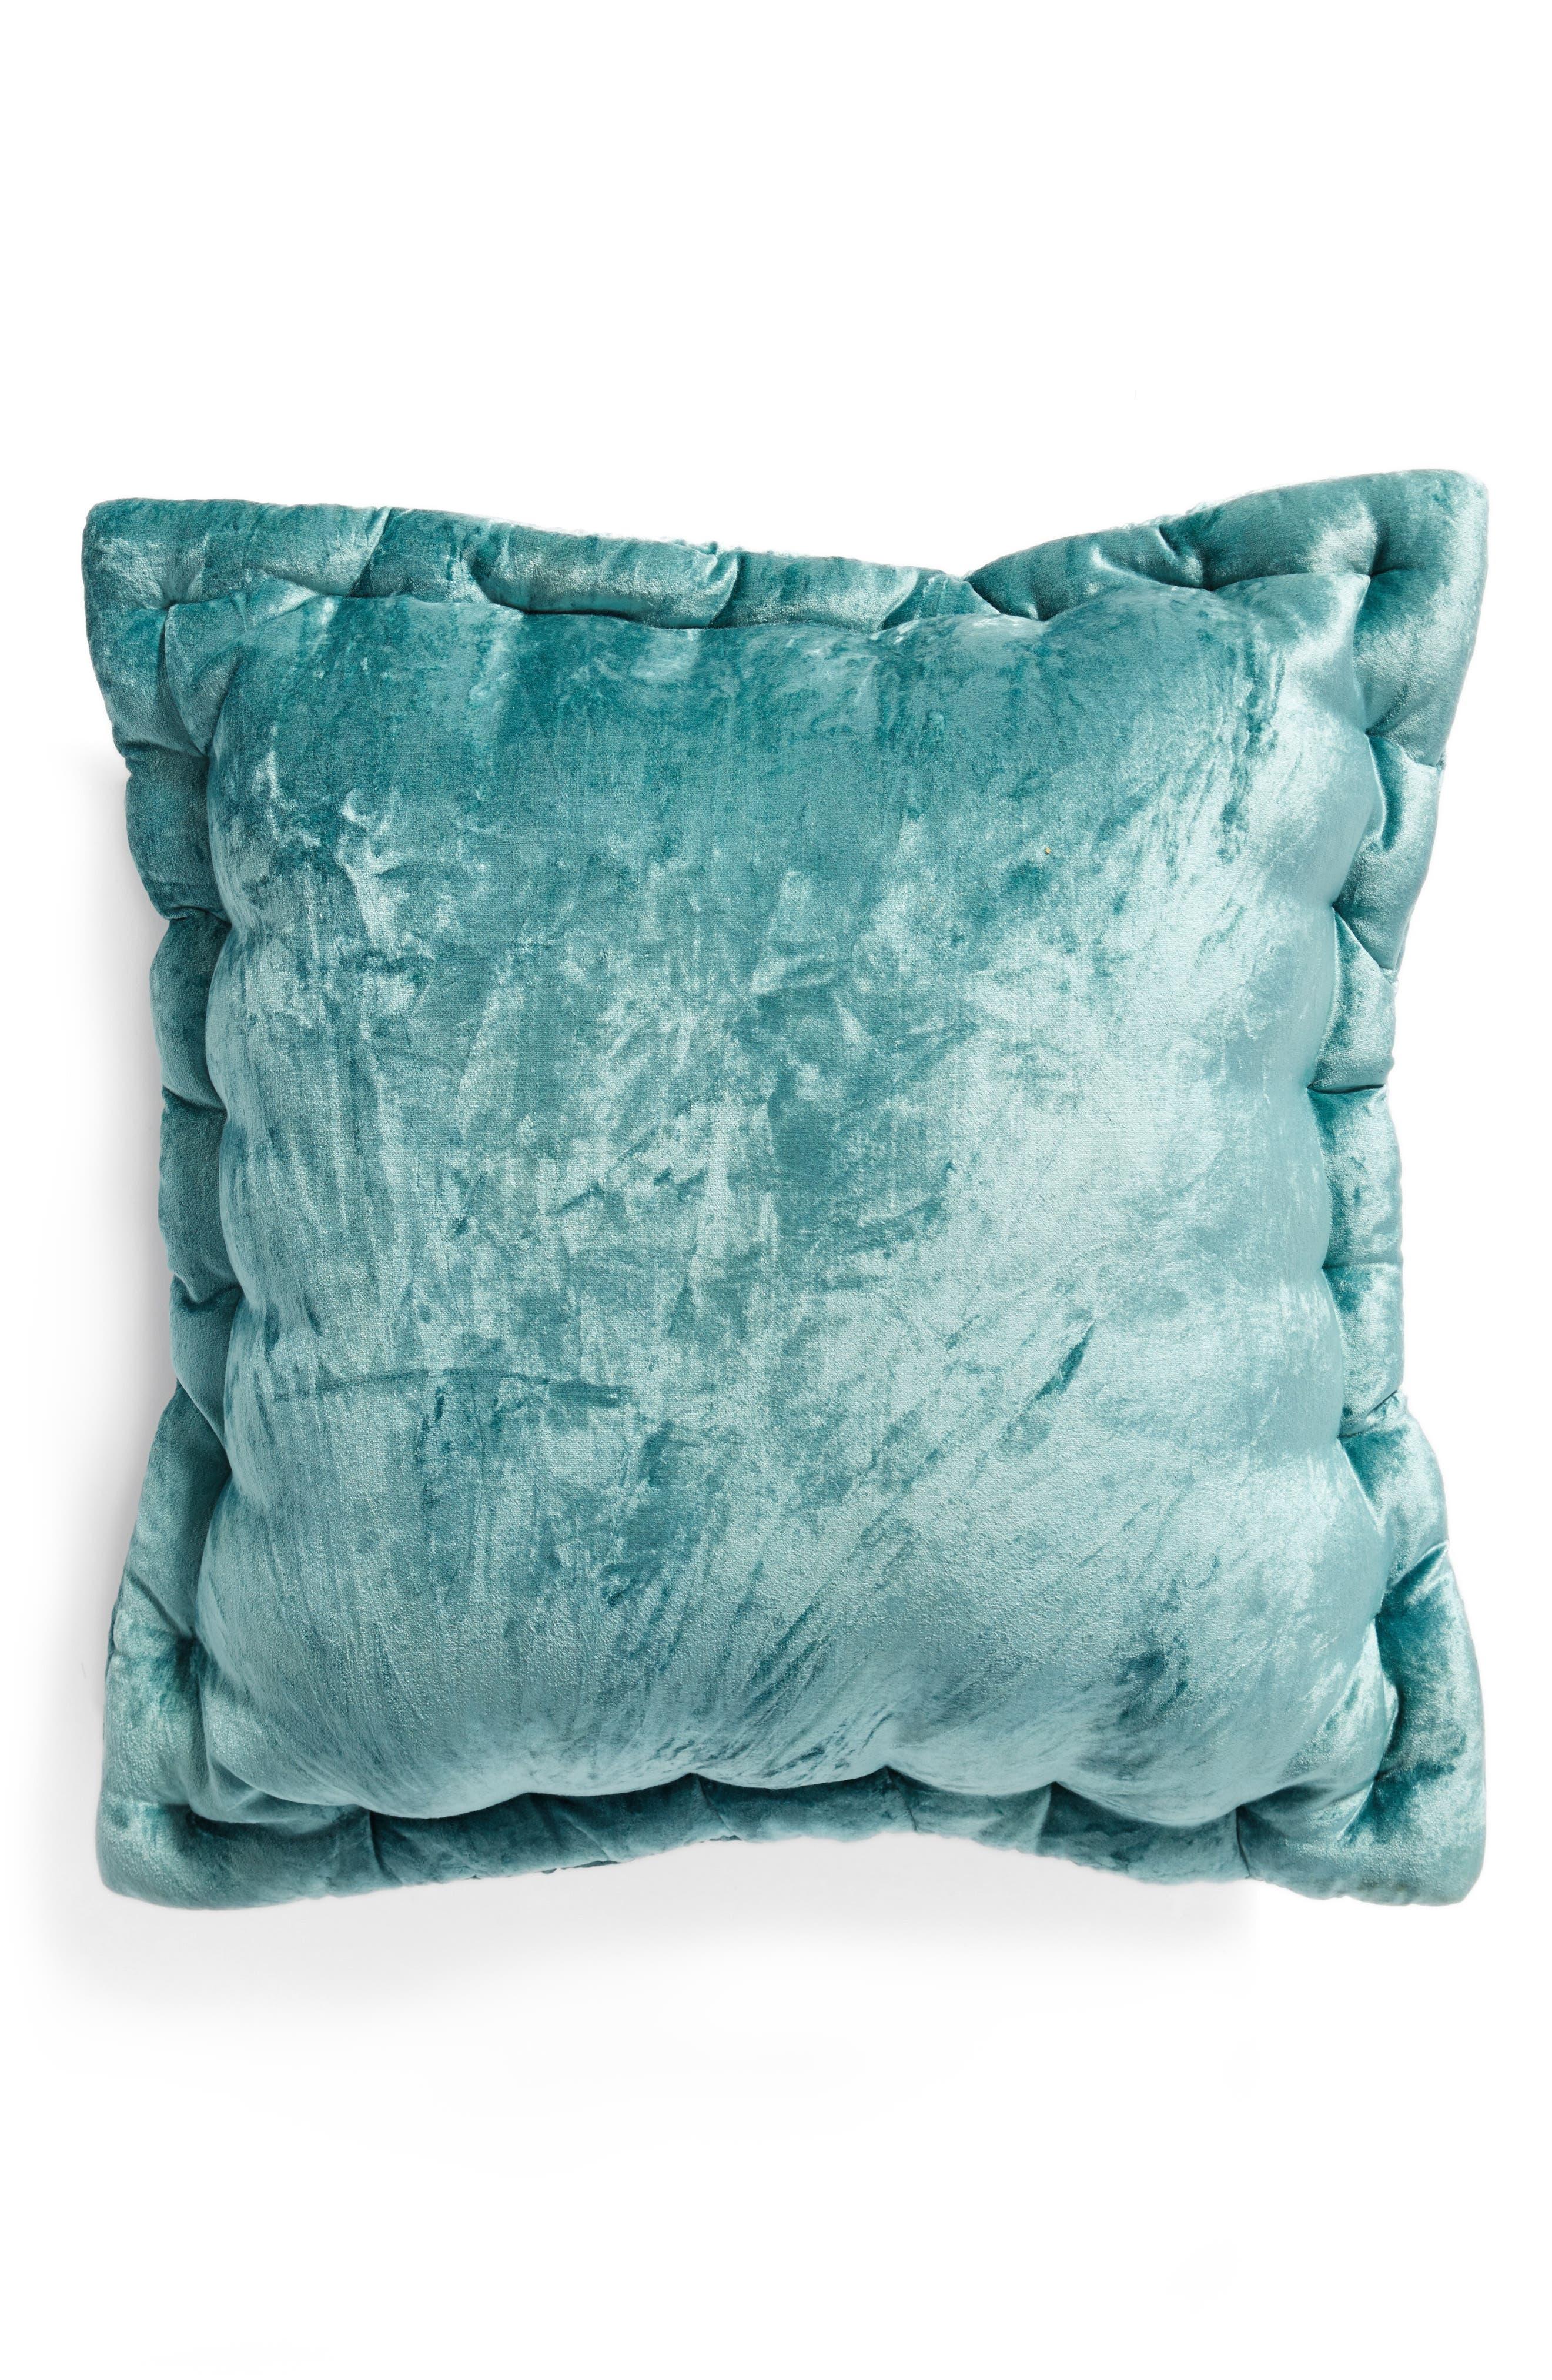 Velvet Accent Pillow,                             Alternate thumbnail 3, color,                             Teal Titanic